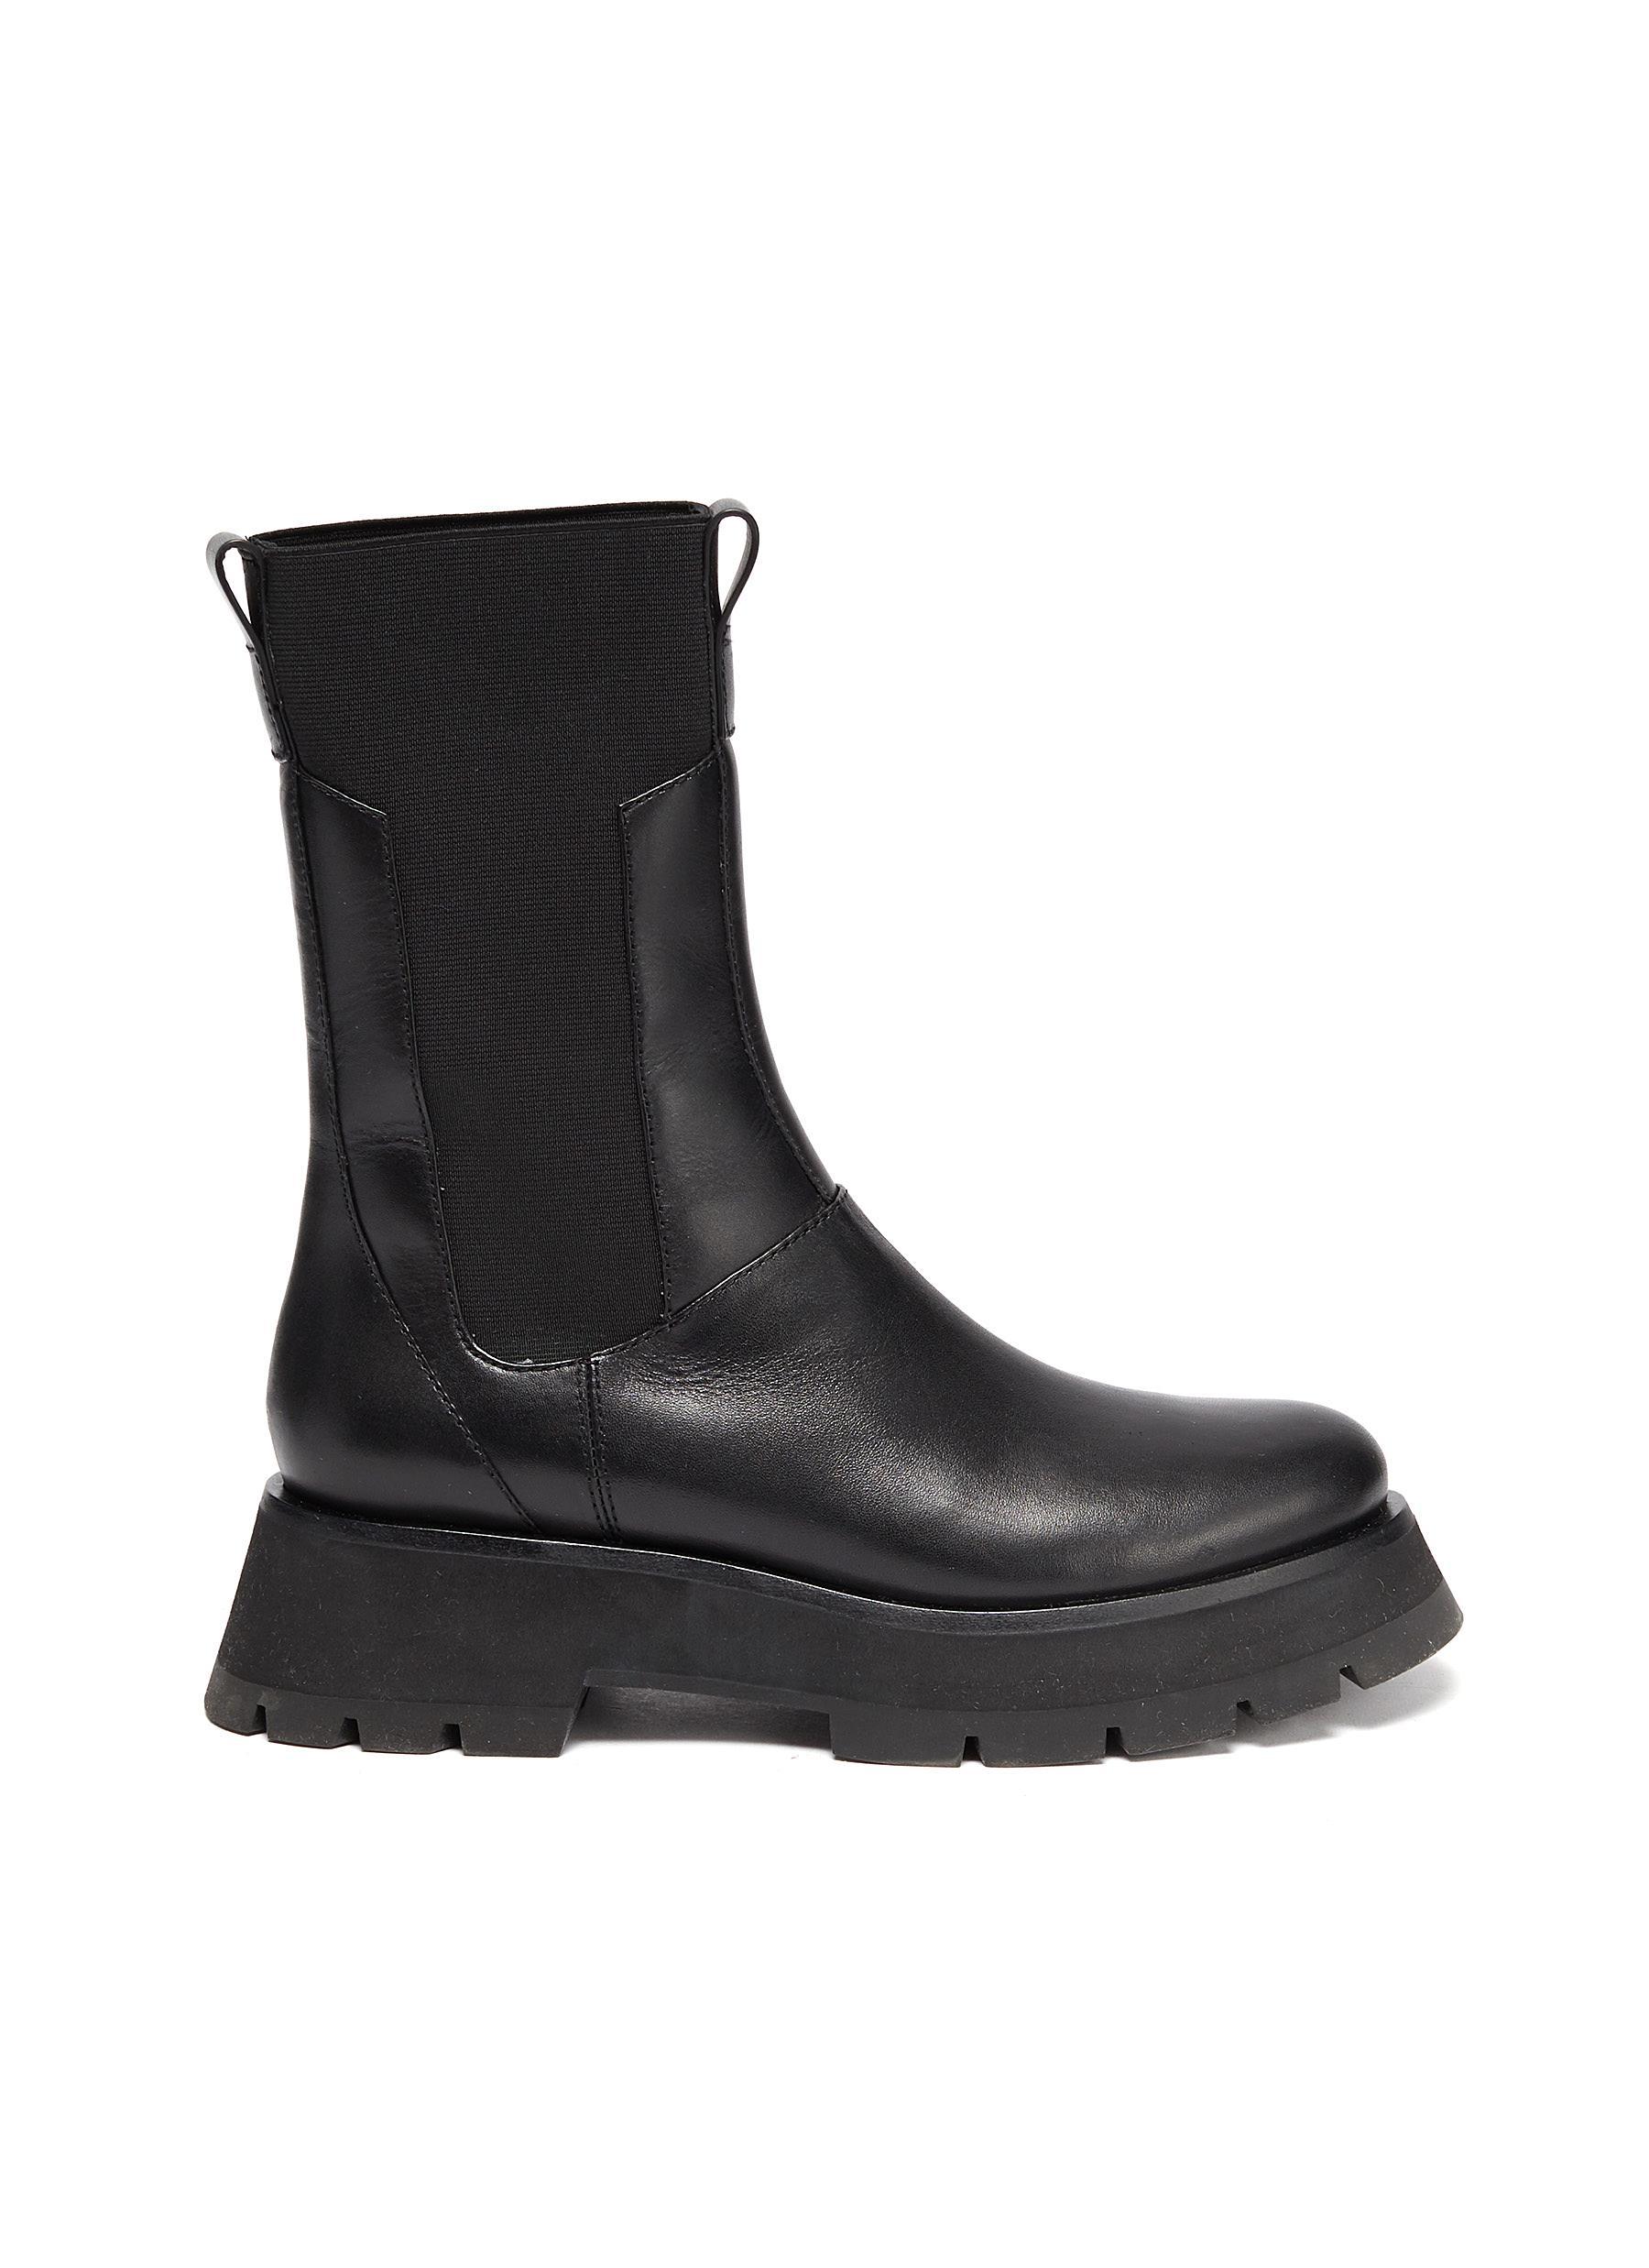 KATE' Lug Sole Leather Chelsea Boots - 3.1 PHILLIP LIM - Modalova